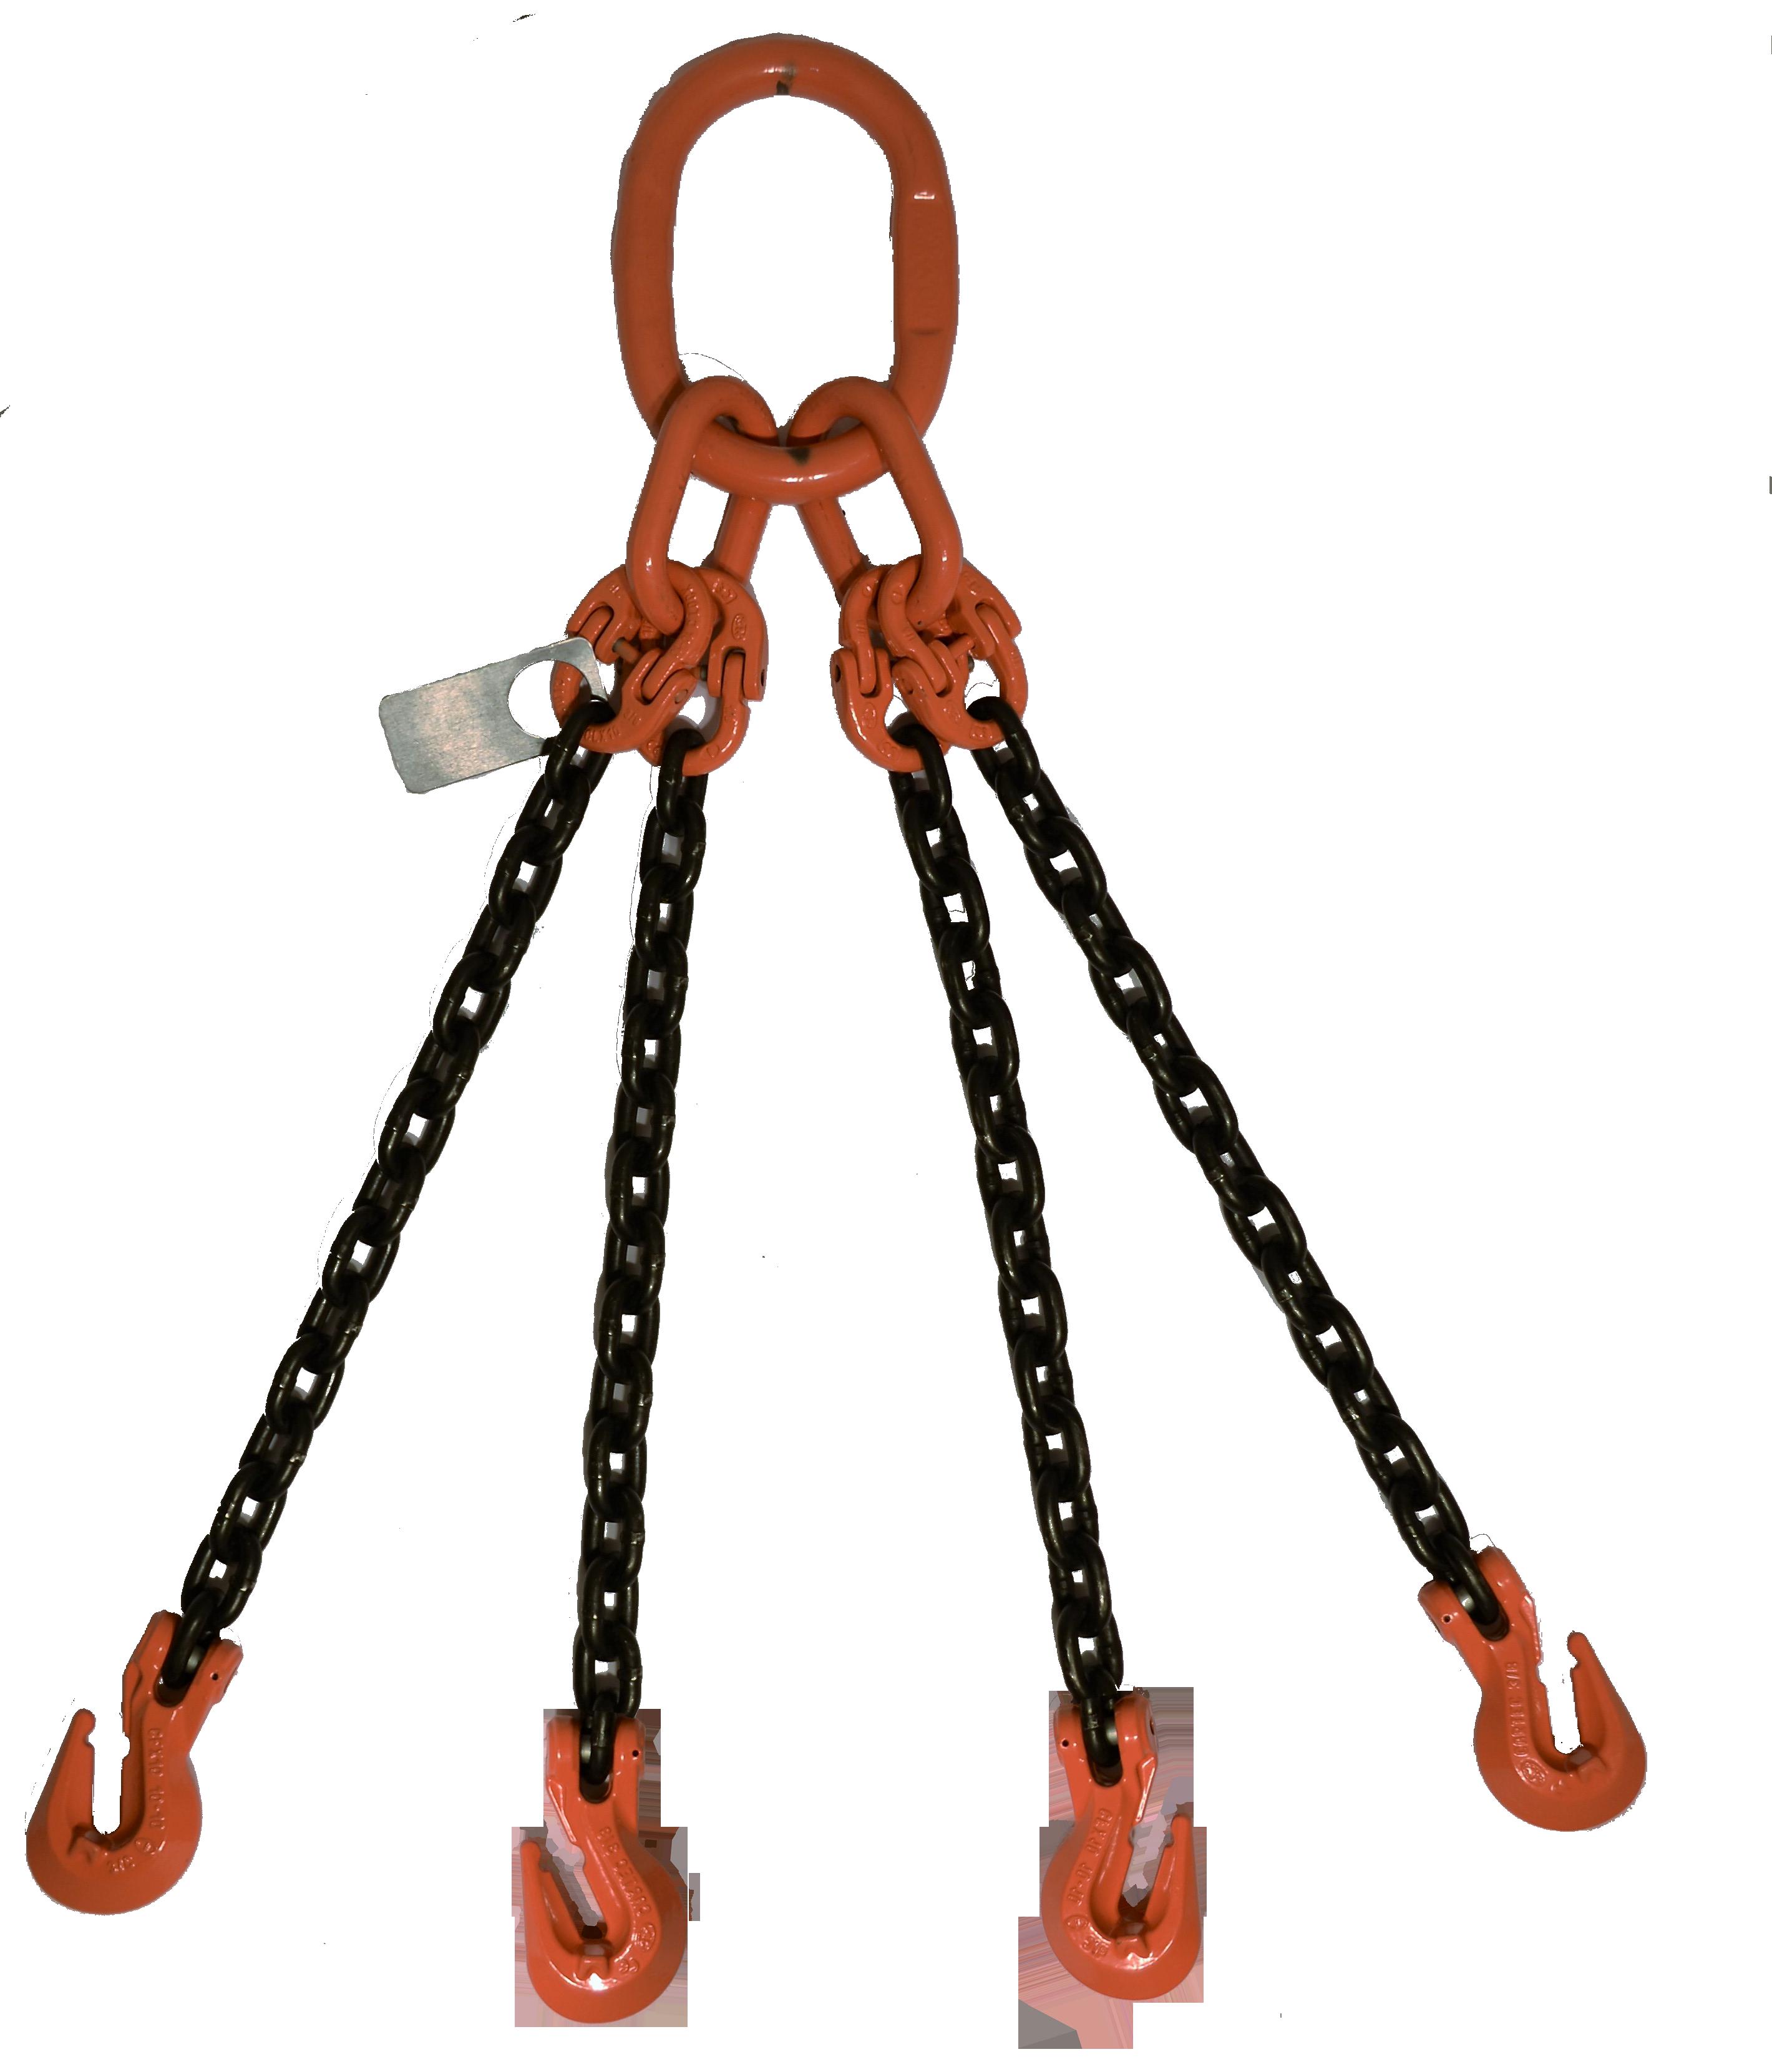 QOG GR-100 Chain Sling